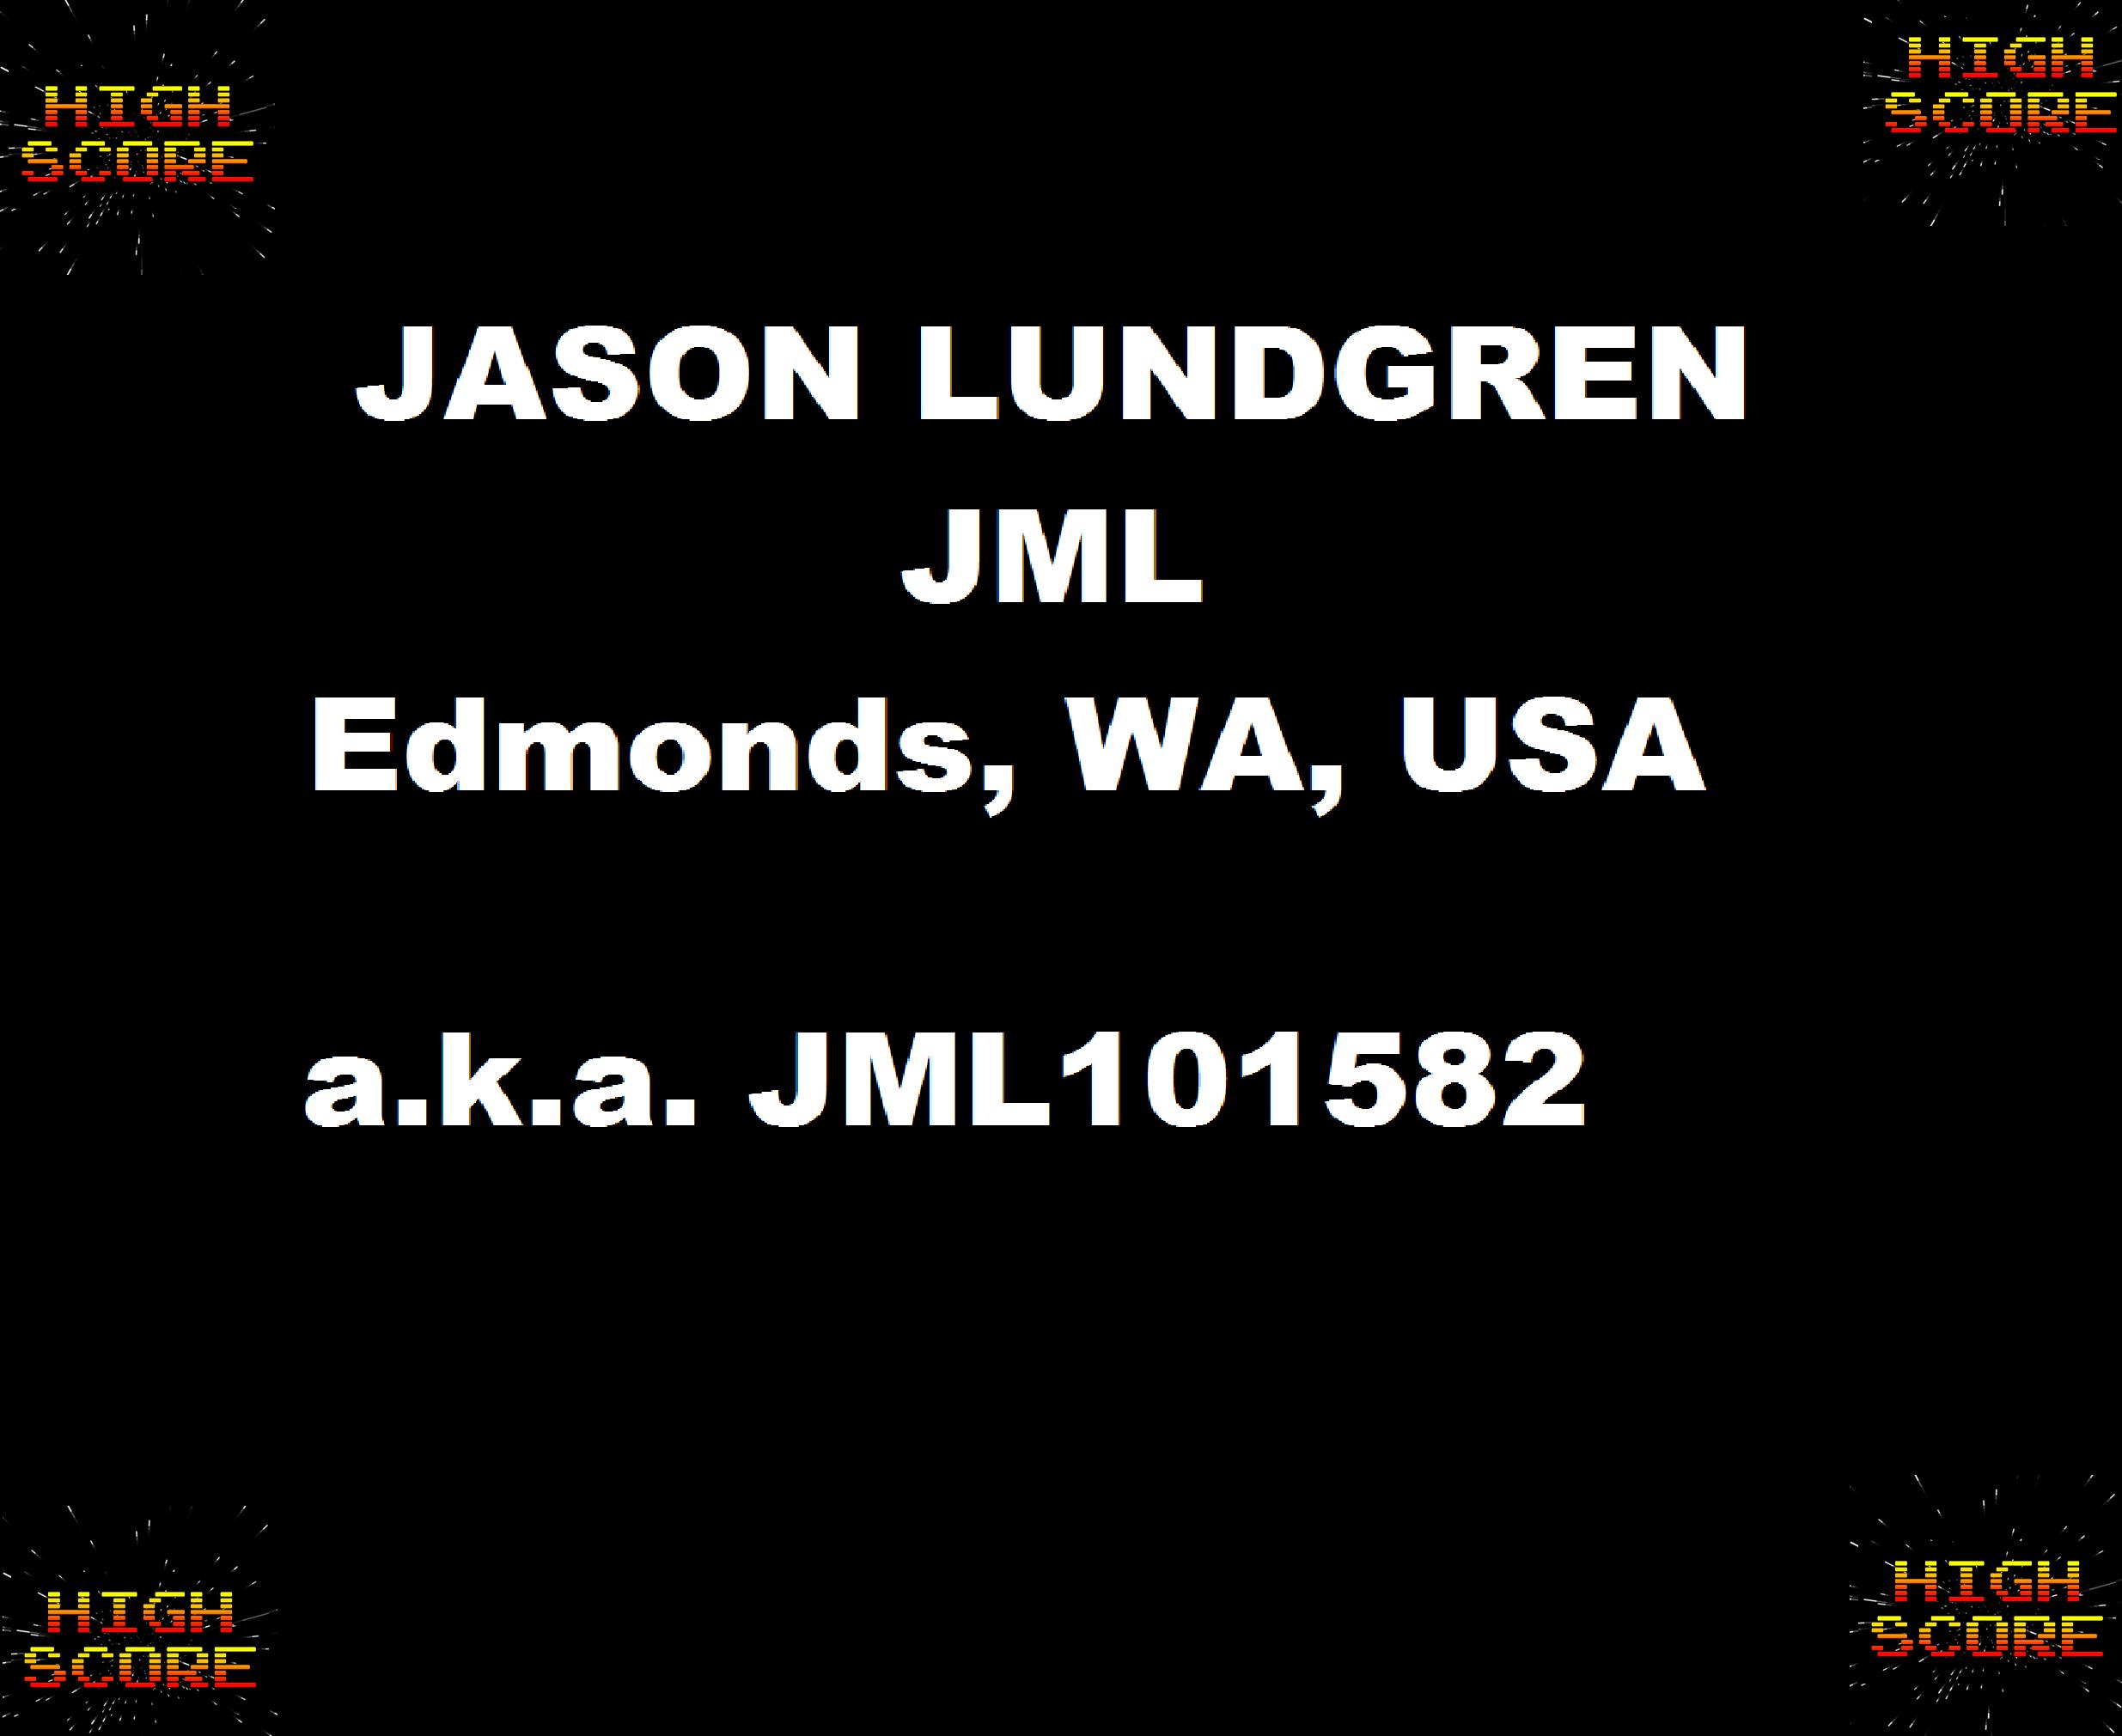 JML101582: James